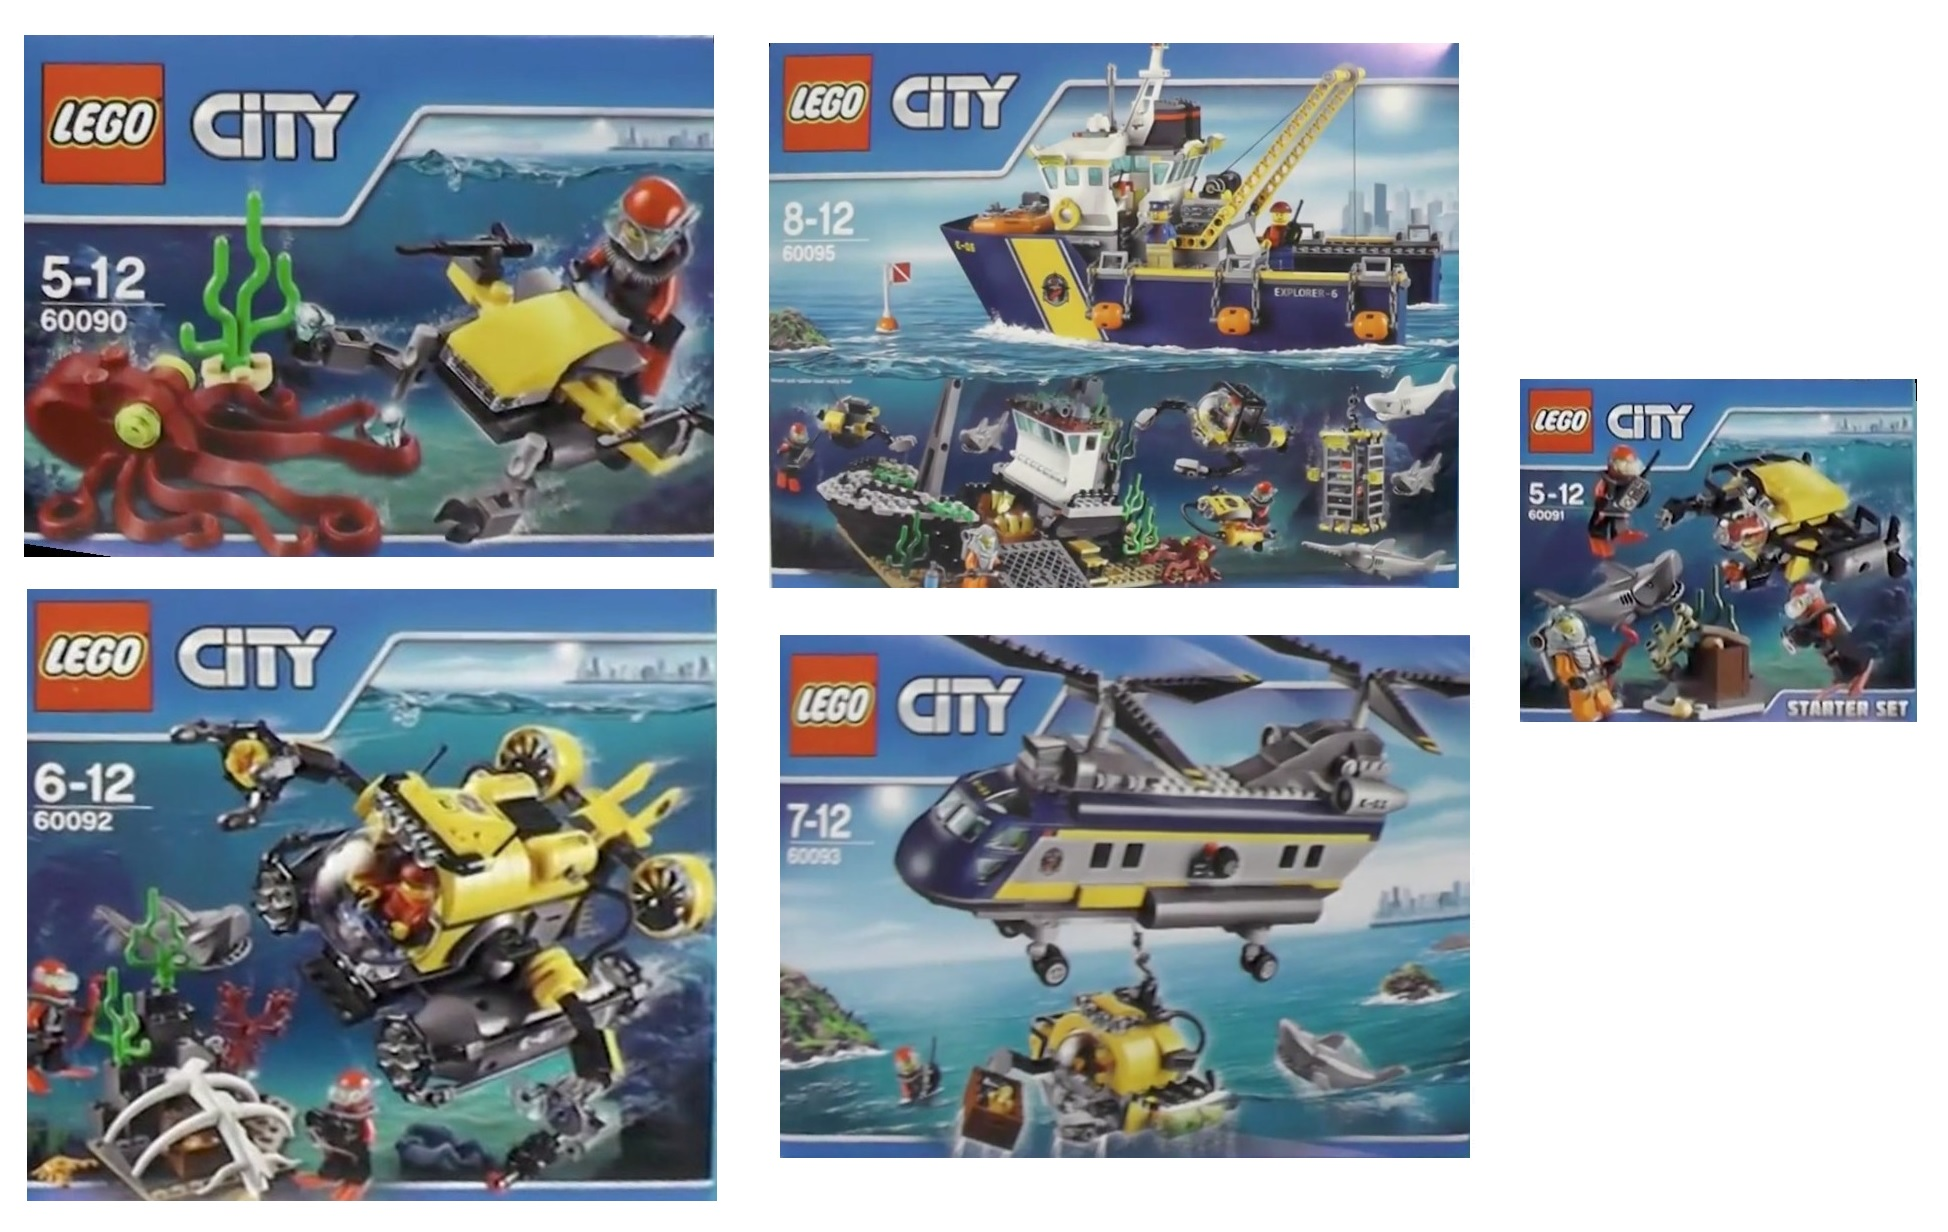 LEGO City Deep Sea Explorer 2015 Sets 60090 Scuba Scooter, 60091 Deep Sea Starter Set